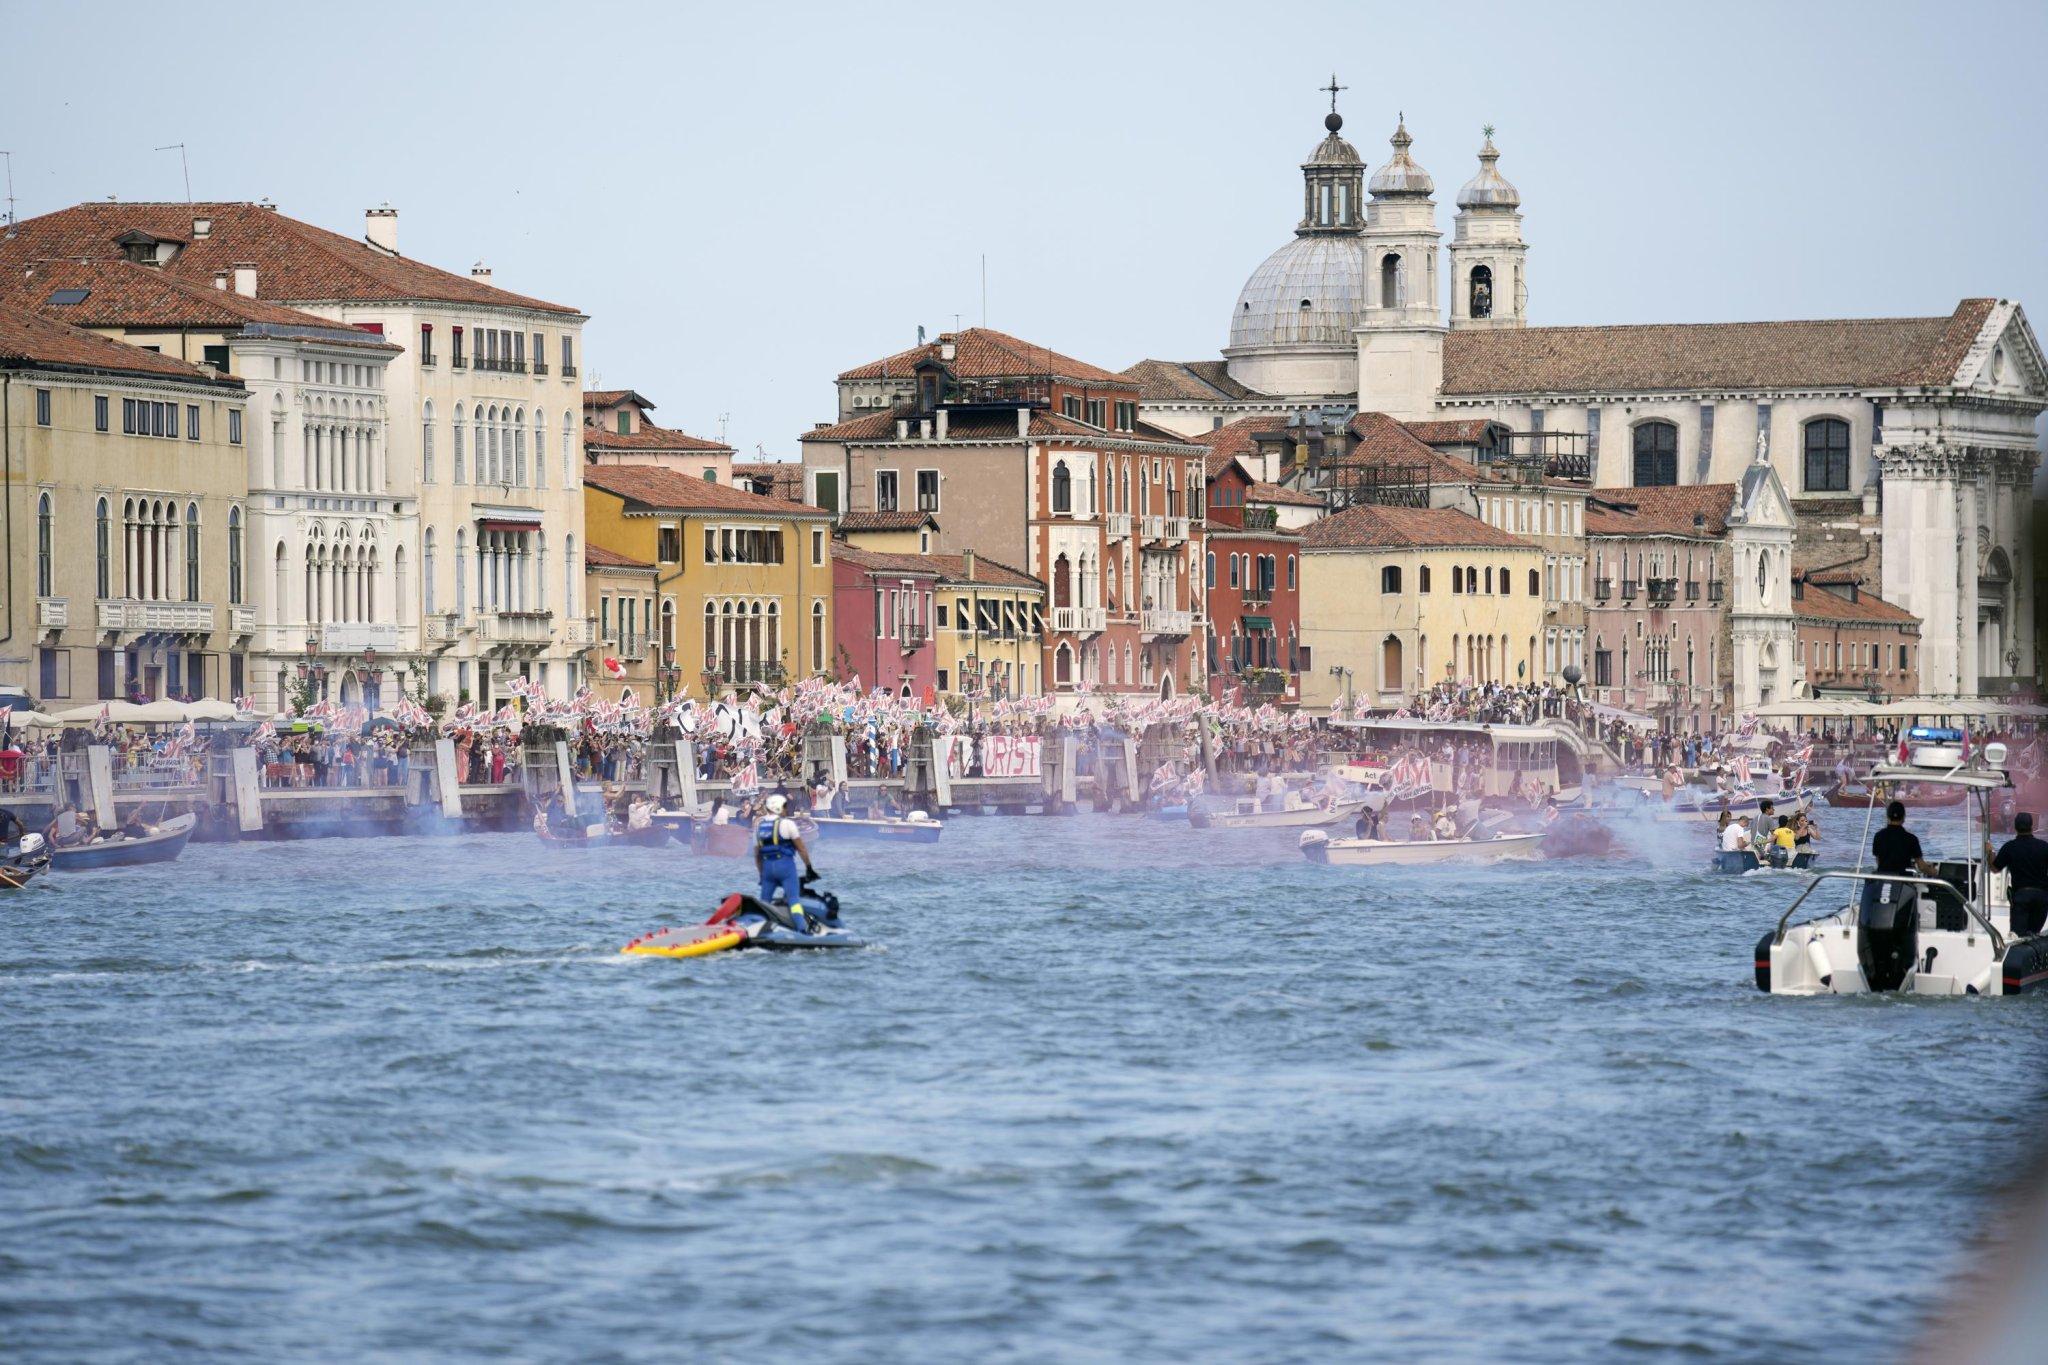 Venice avoids designation as UNESCO heritage site in danger